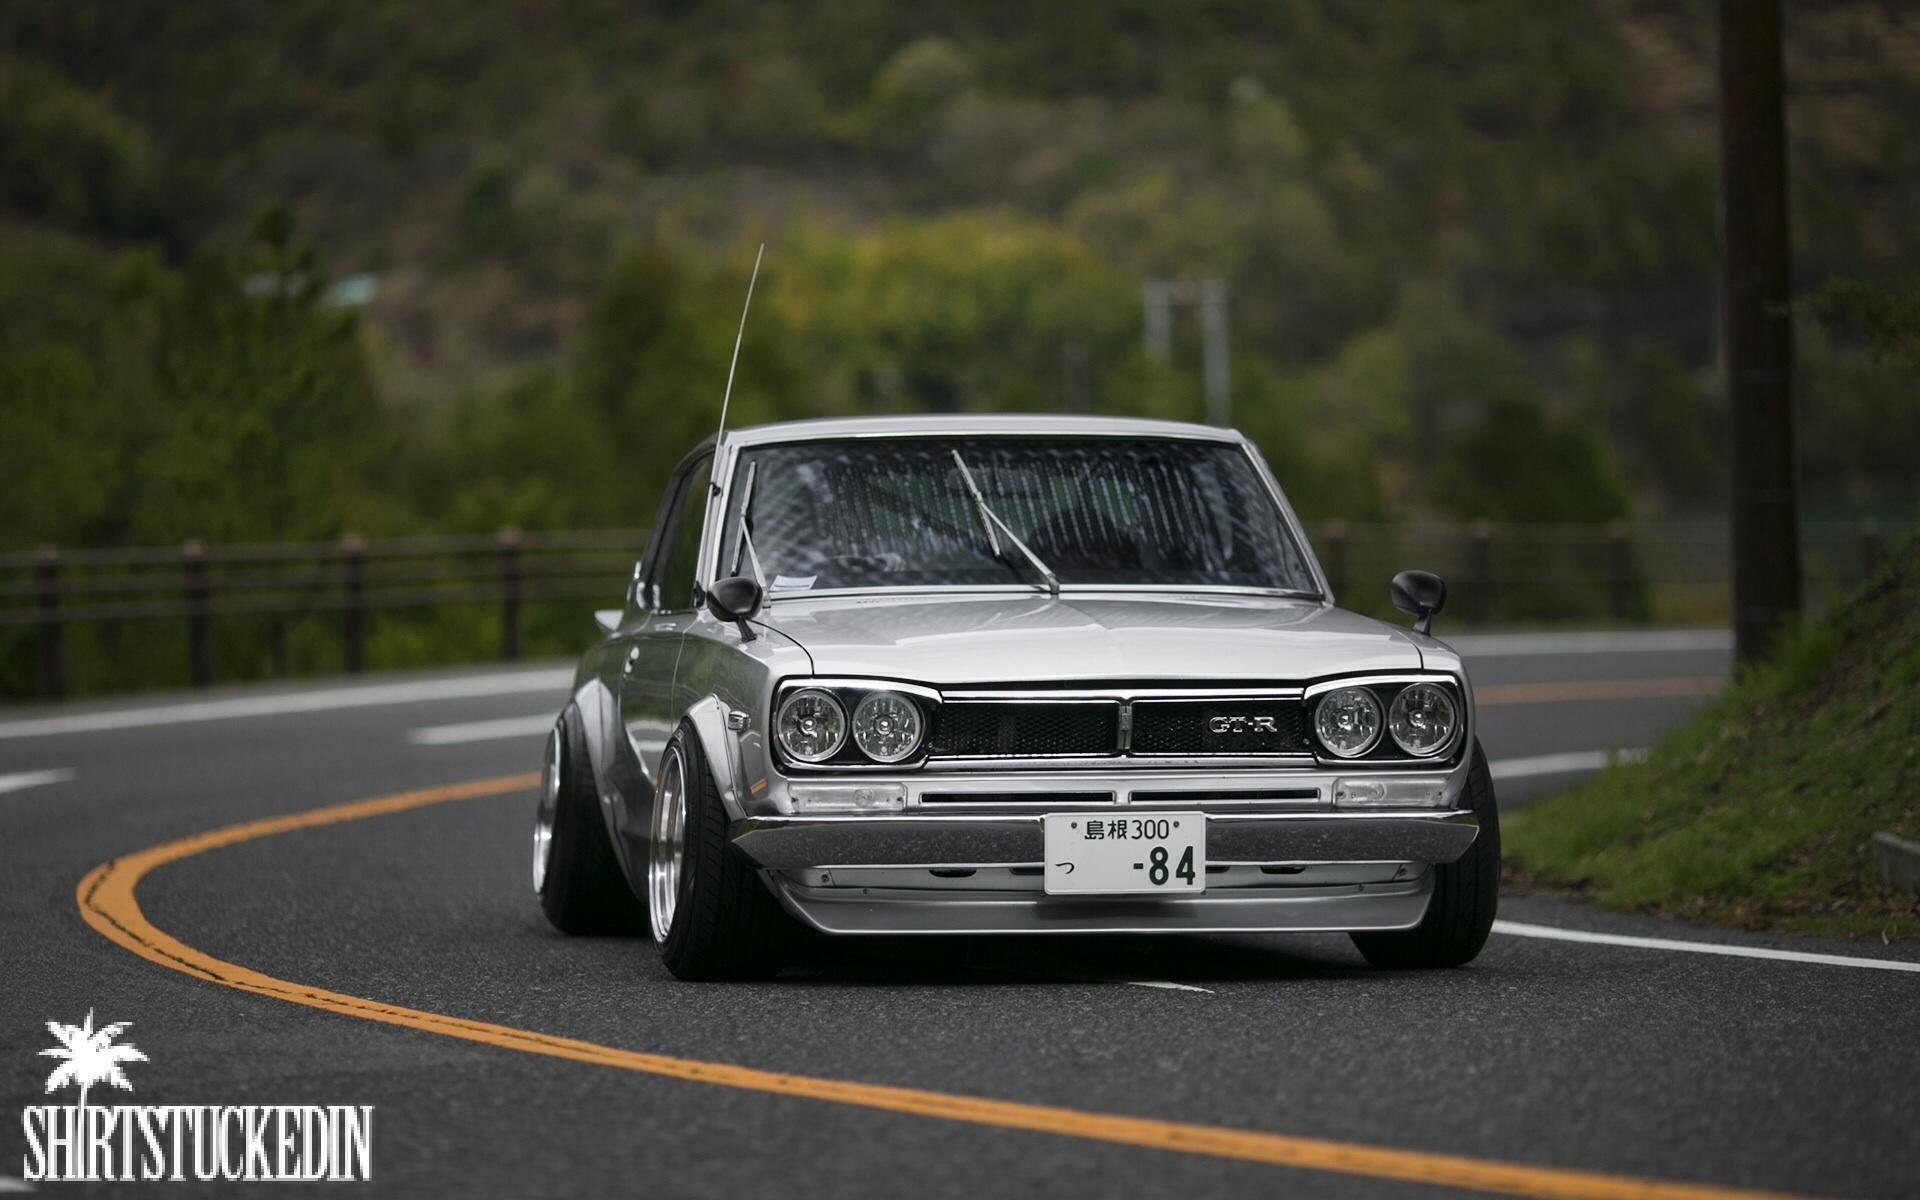 1972 Nissan Skyline 2000 Gtr Engine